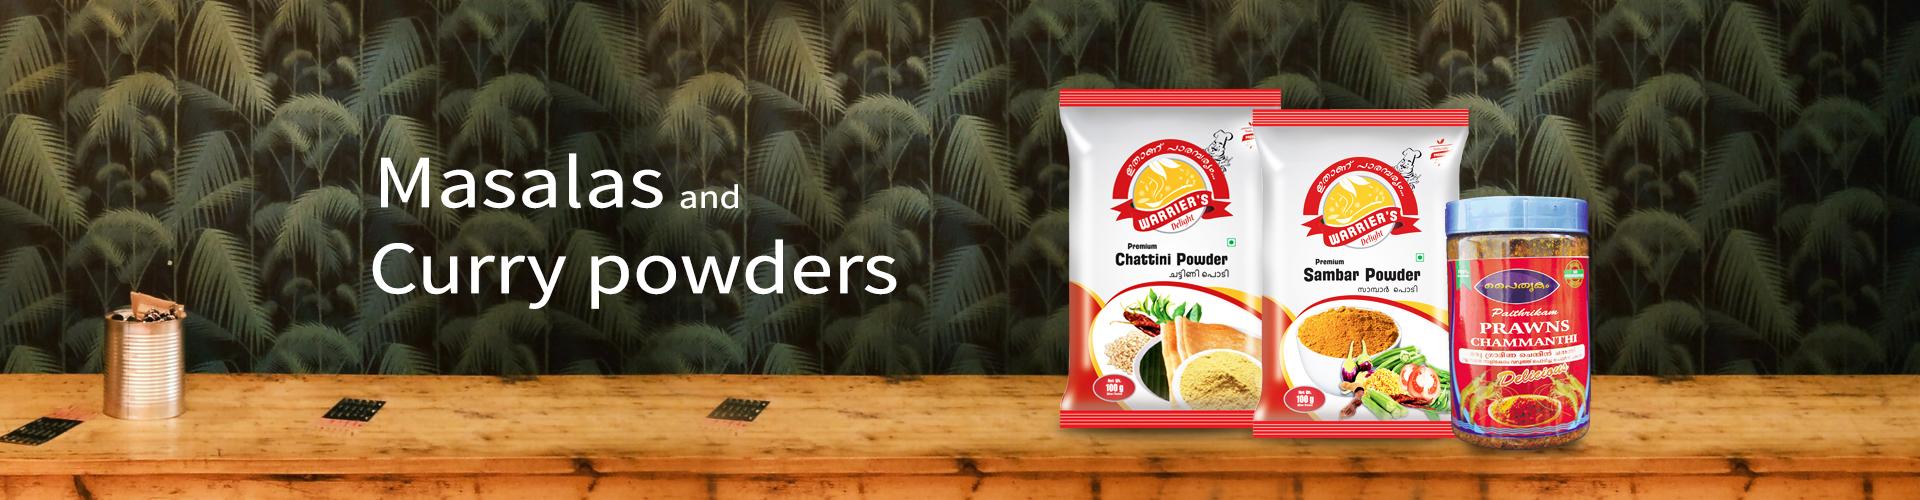 Masalas & Curry powders